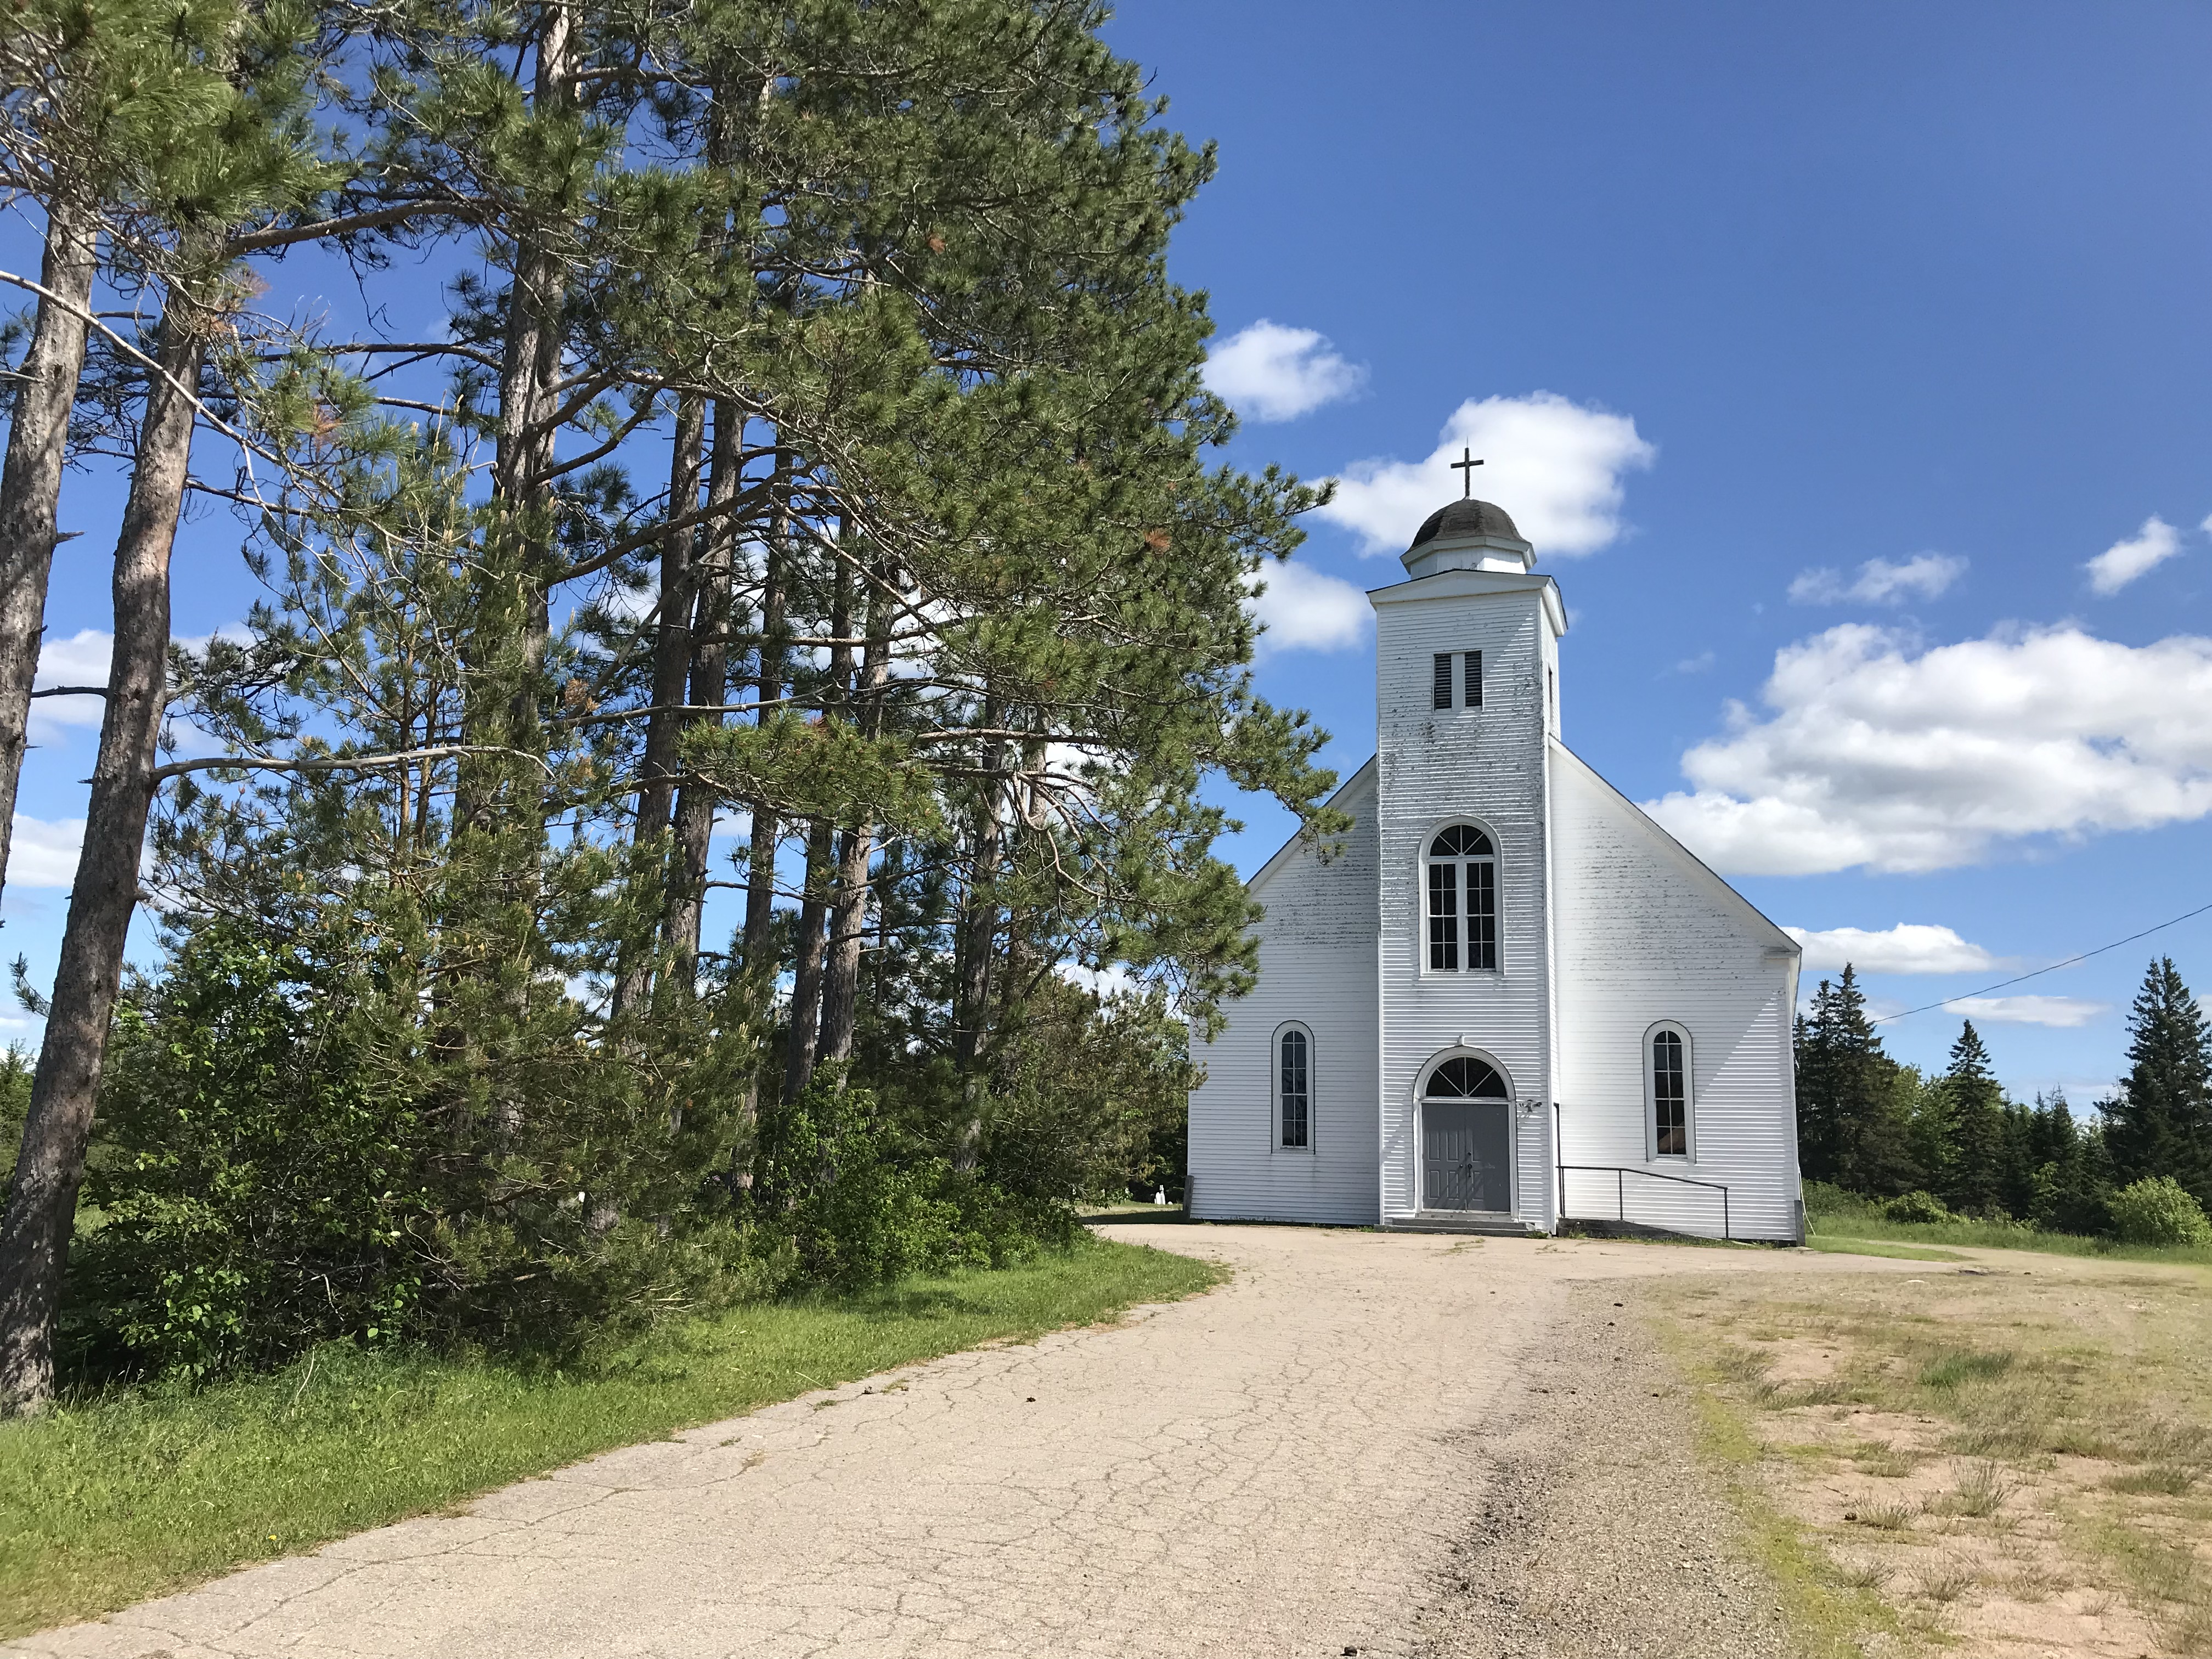 Doors Open for Churches